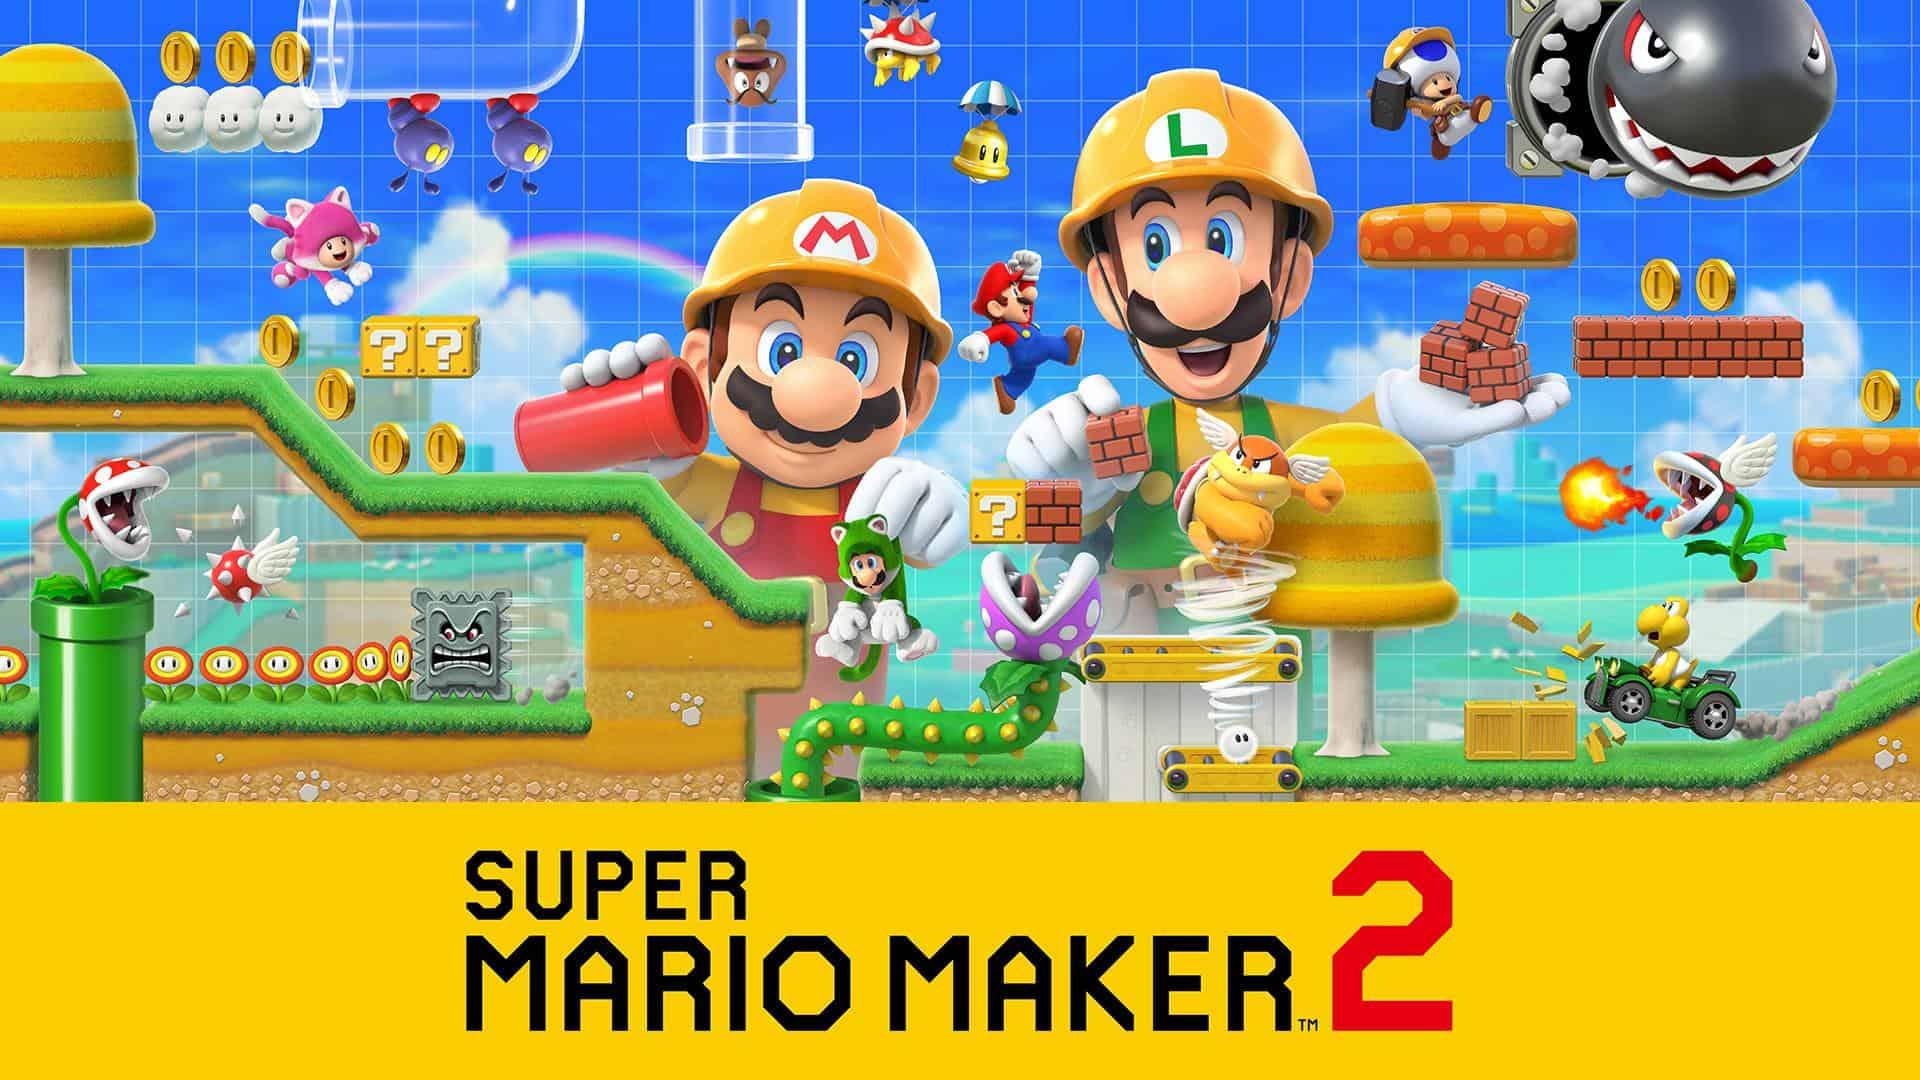 Best Super Mario Games - Super Mario Maker 2